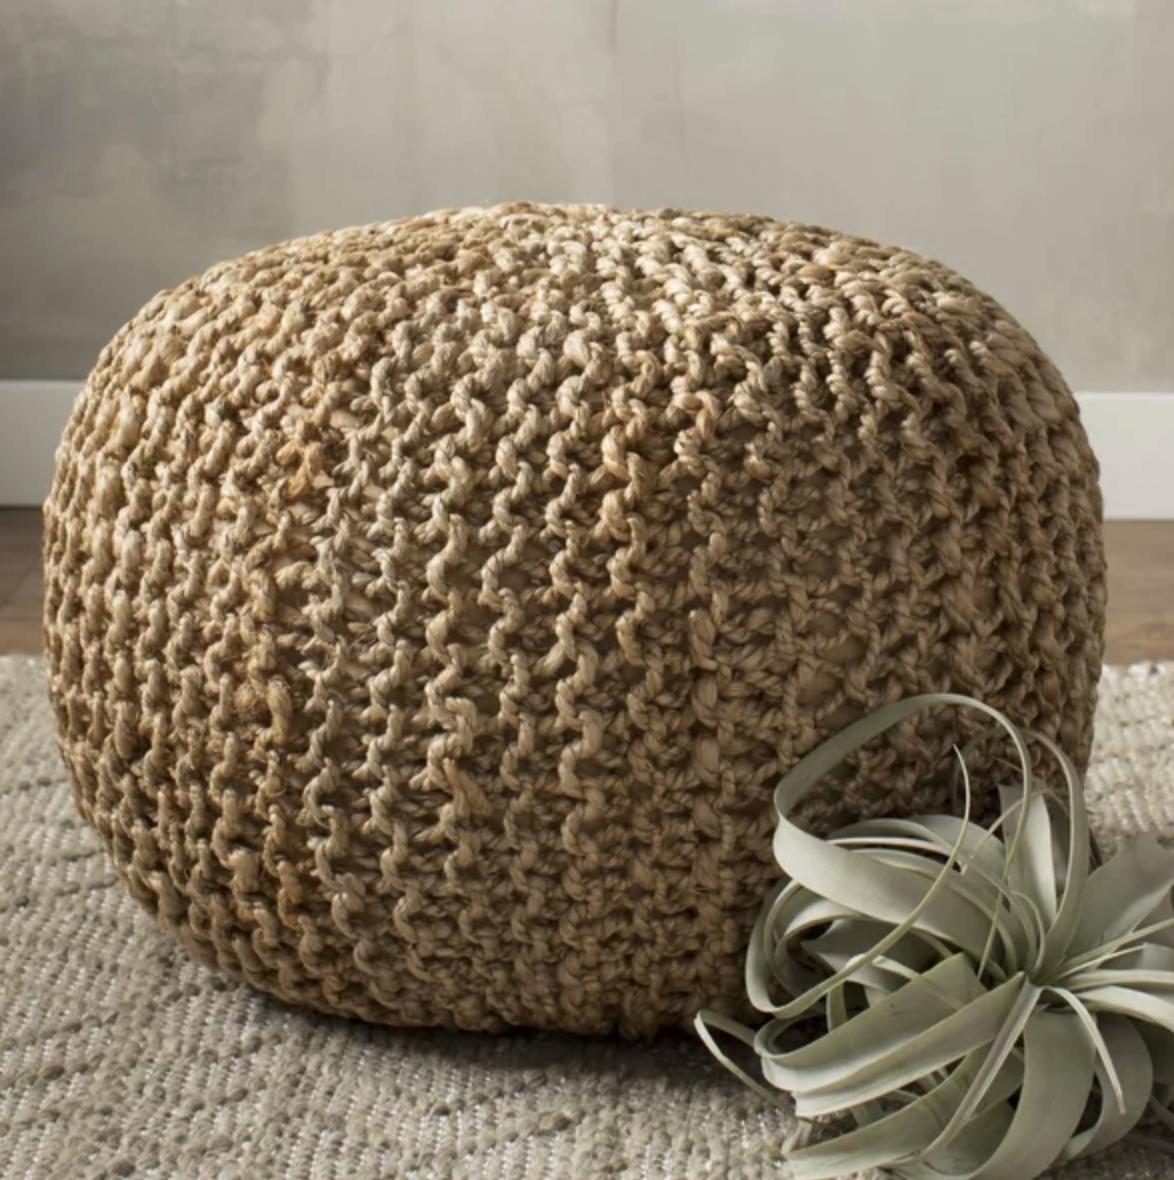 odin-sphere-ottoman